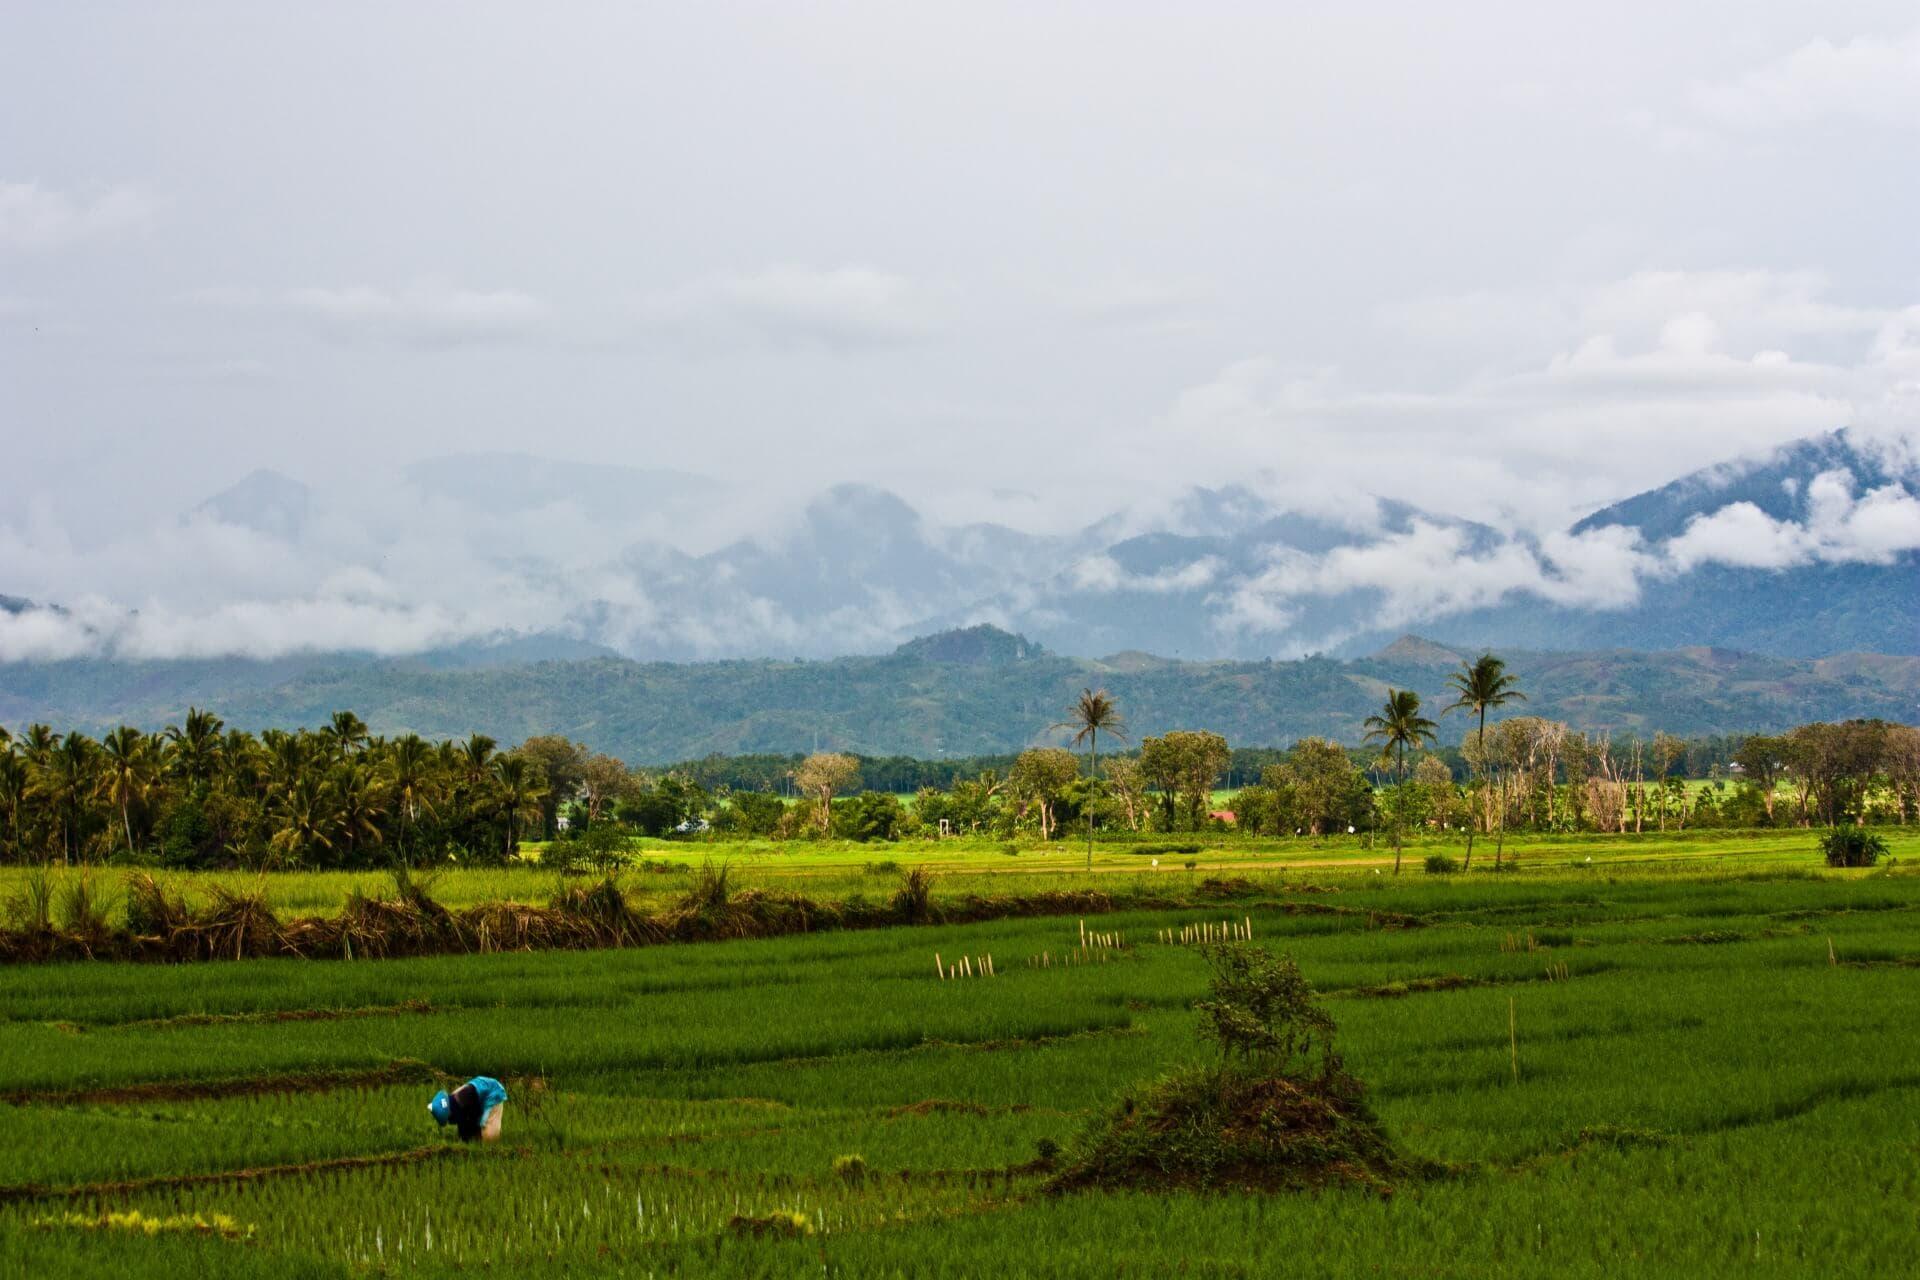 Rice Farmer in the Kerinci Valley, Jambi, Sumatra, Indonesia